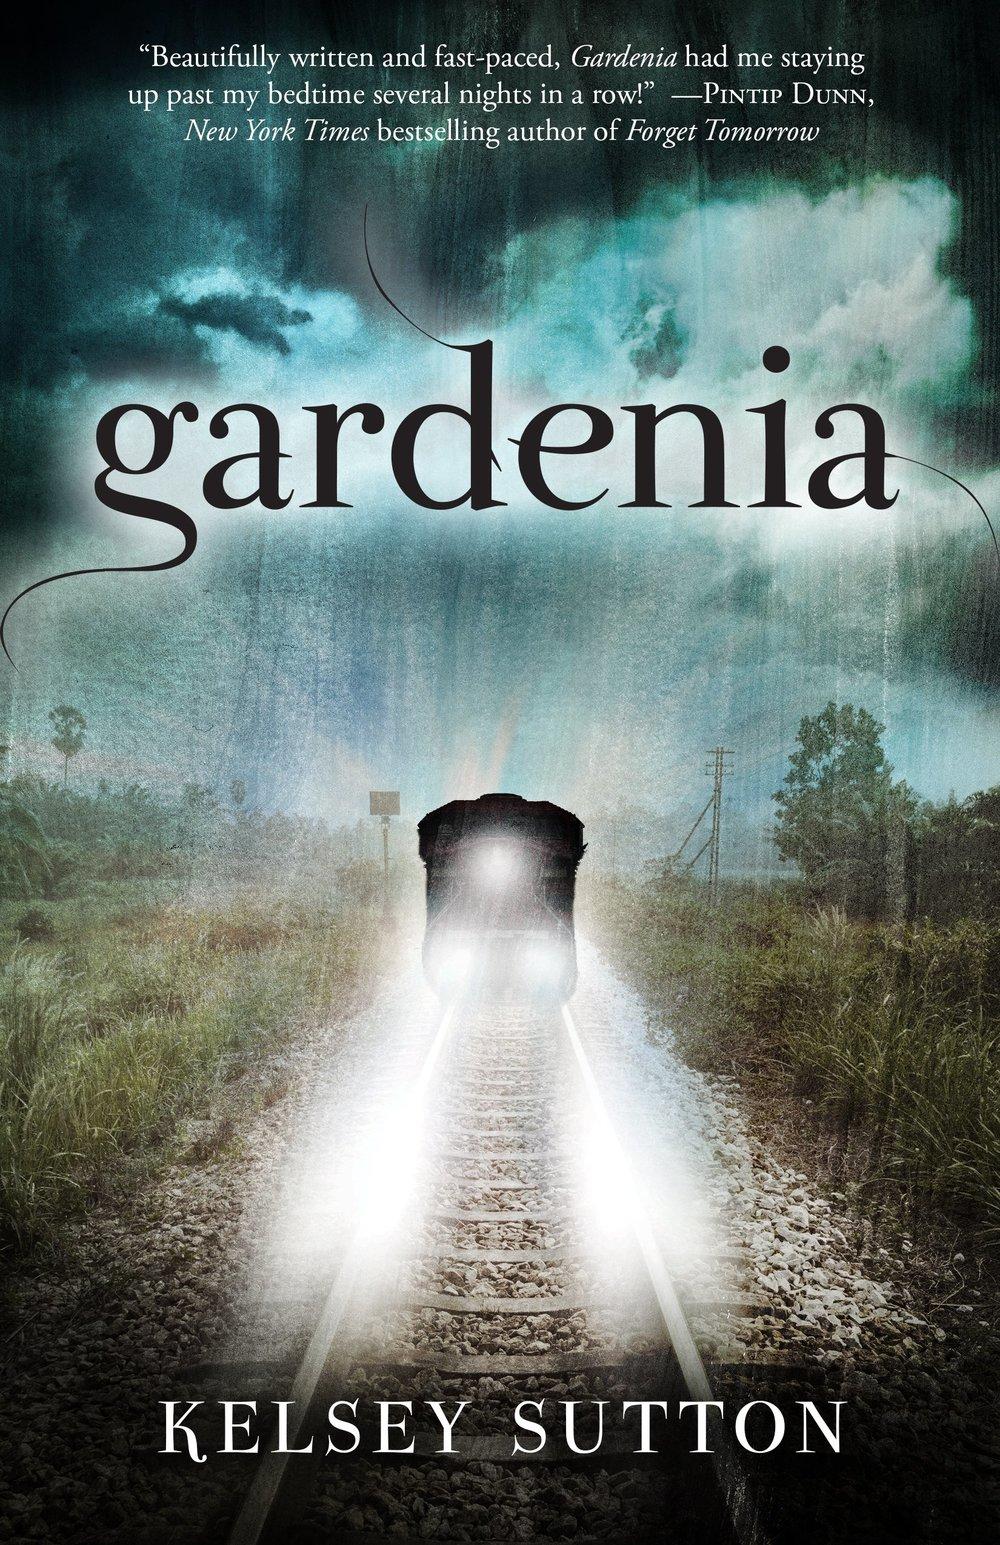 kelsey-sutton-gardenia.jpg